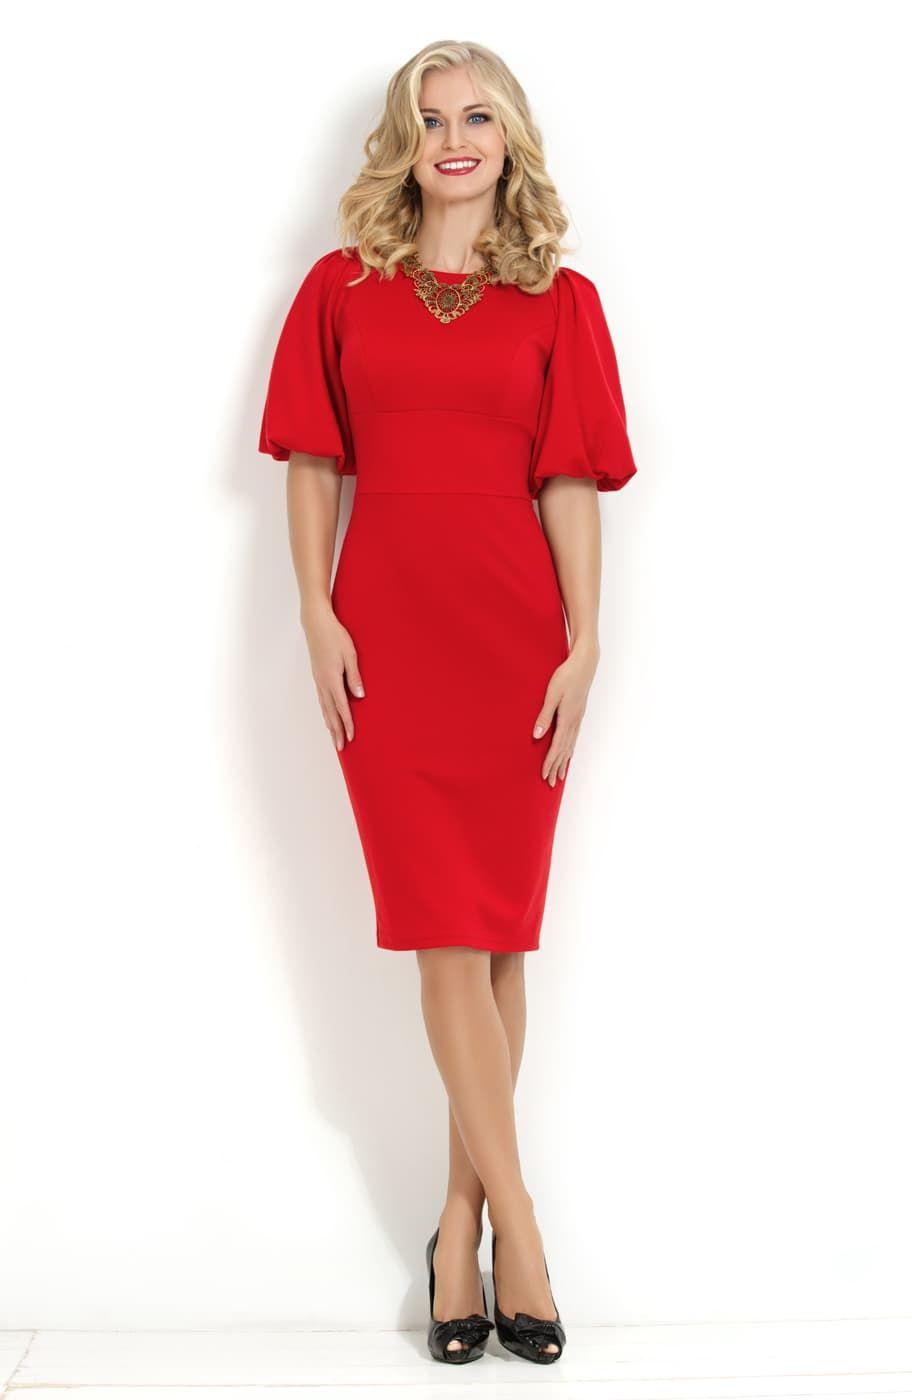 94ed2e0cee8 Платье из джерси Donna-Saggia DSP-169-29t от производителя